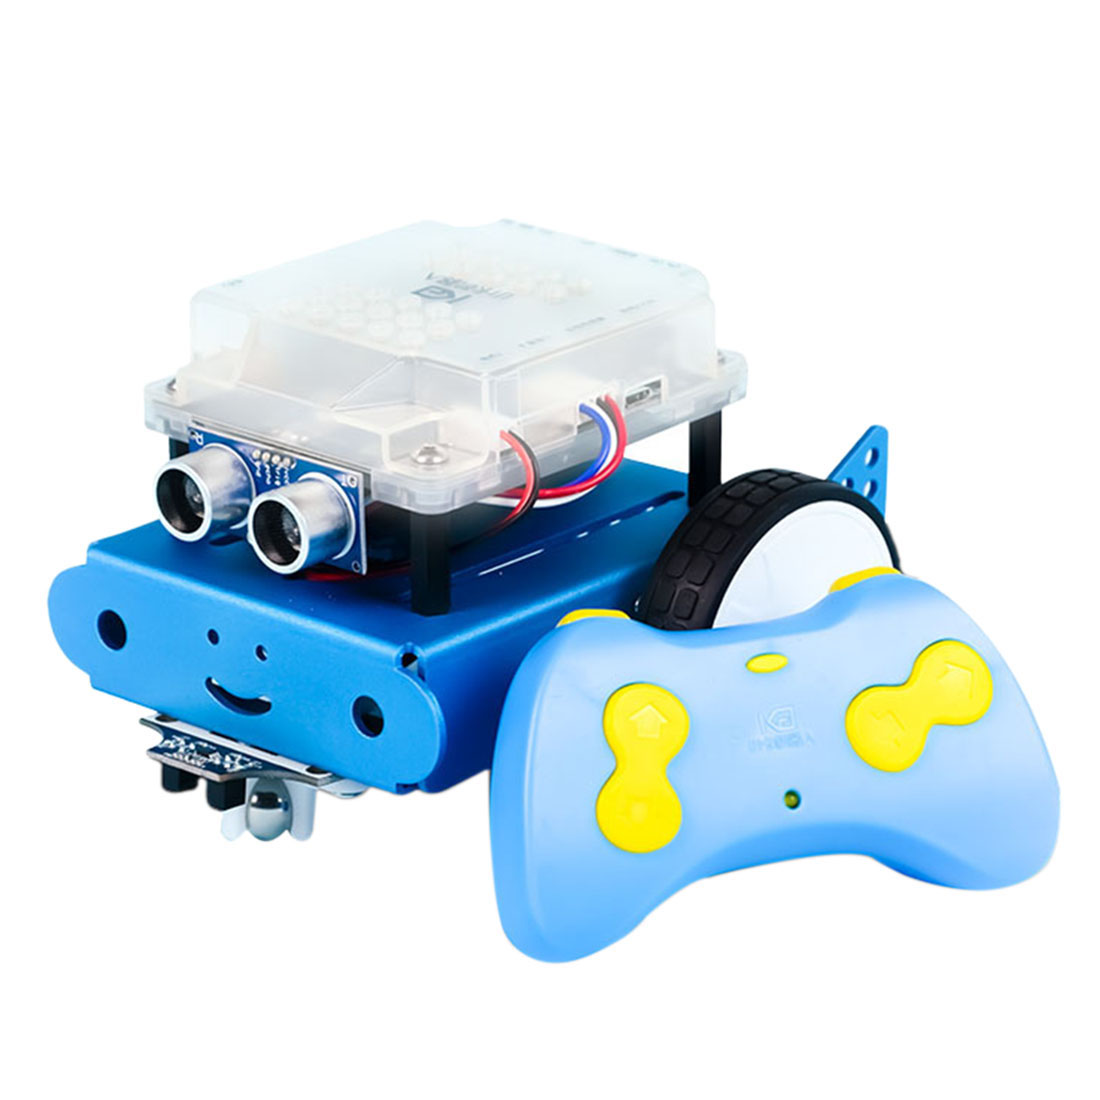 DIY Smart Robot Car Kit APP Control Programming Obstacle Avoidance Line-Tracking Ultrasonic Sensor - Blue